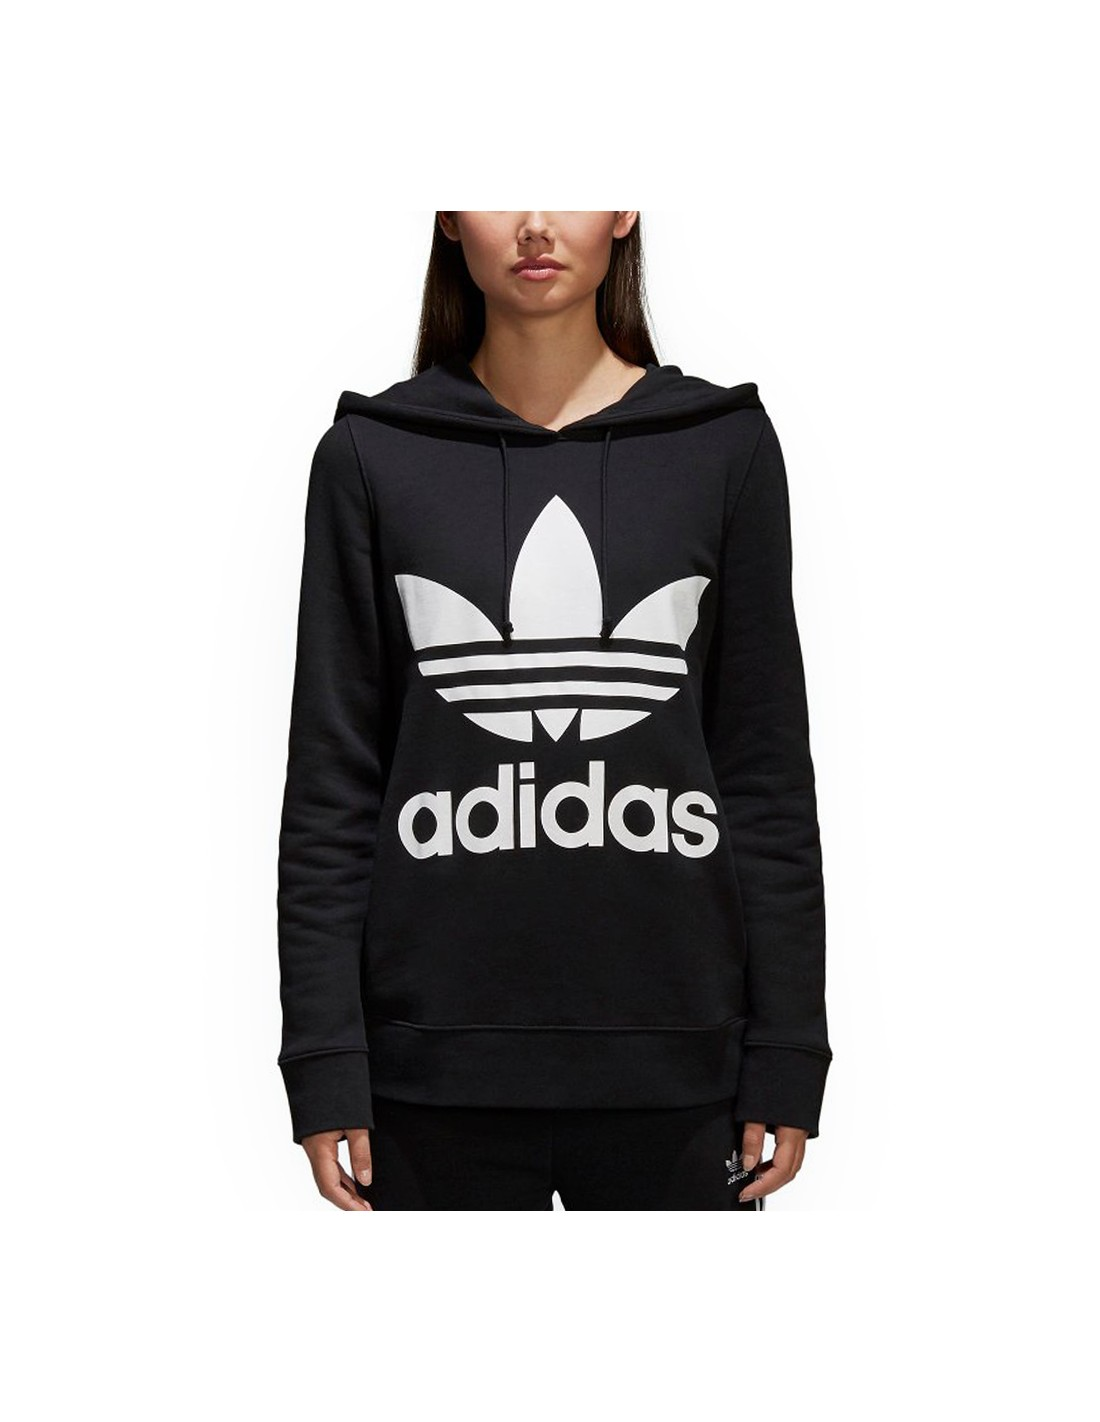 Adidas Originals Womens SST TT Jacket Tramar DH3161